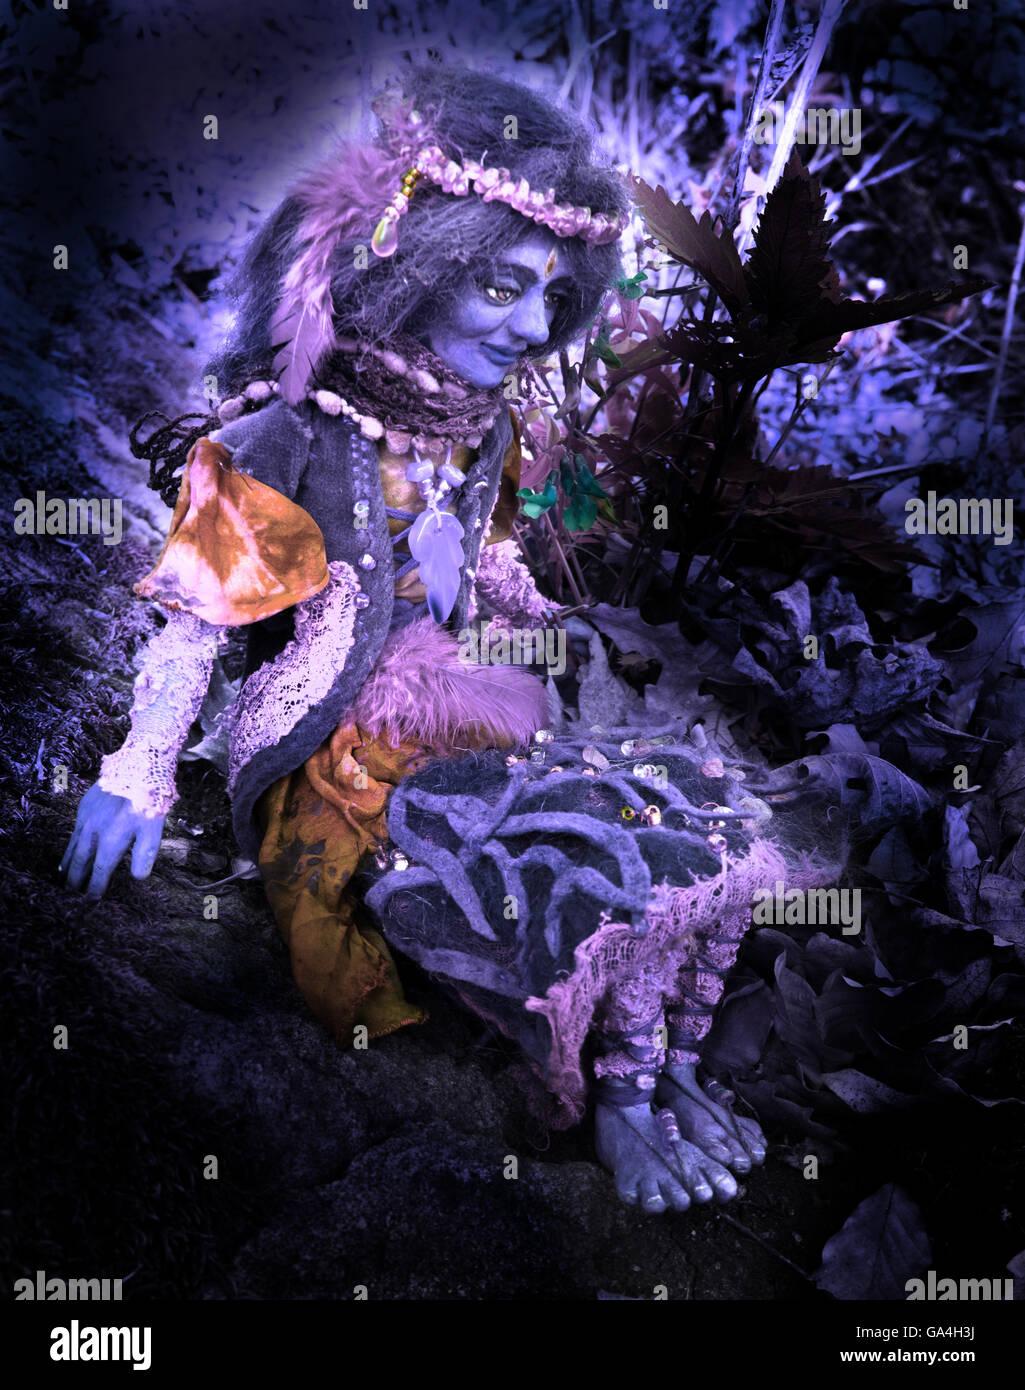 violett fairy doll figure sitting on stone in woodland - Stock Image